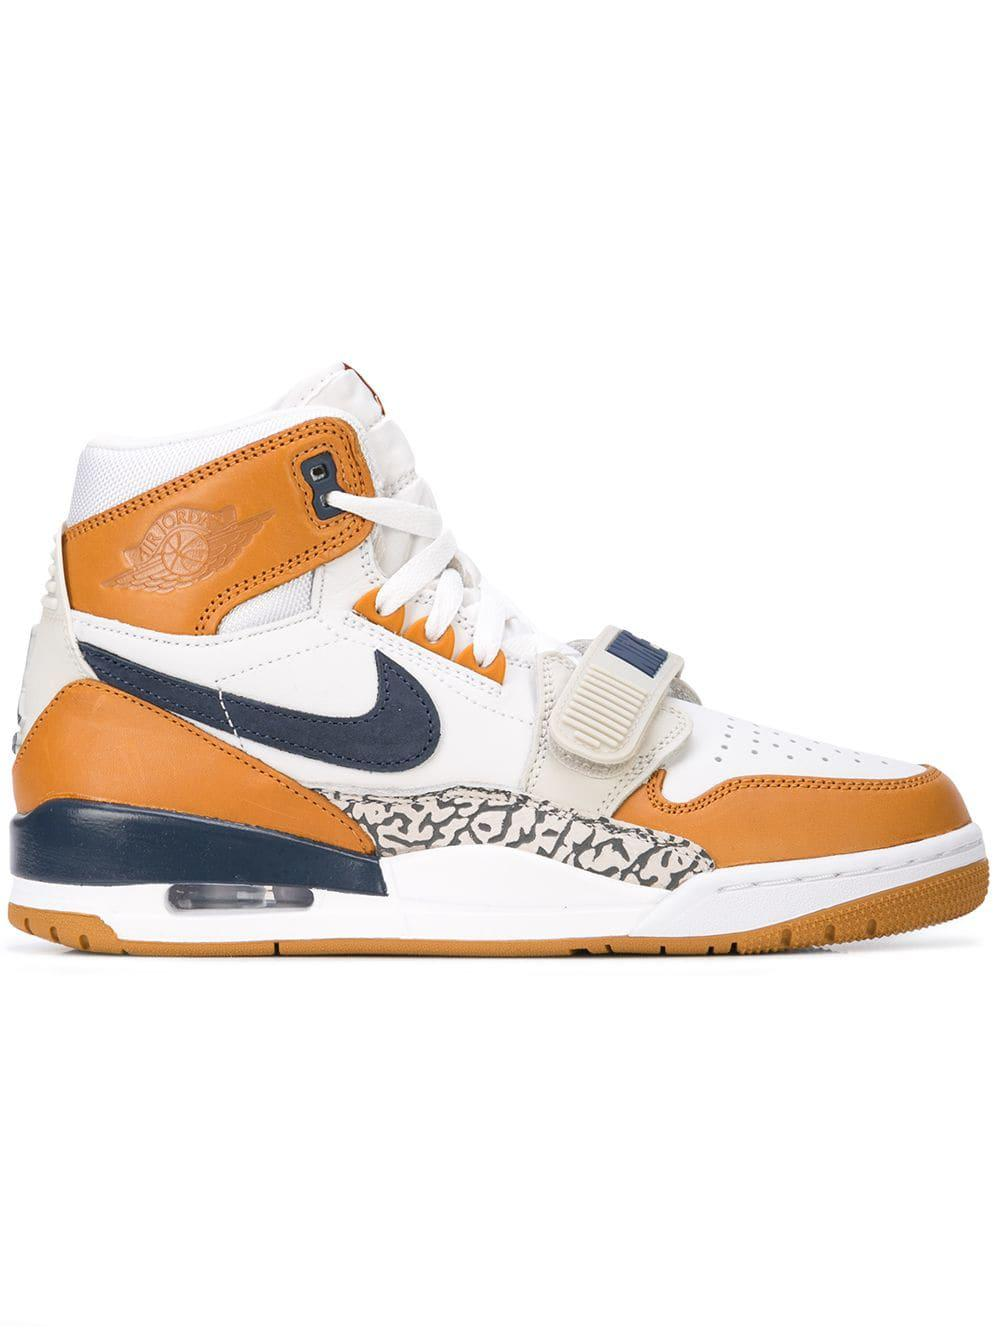 89b017d42d9 Nike Air Jordan Legacy 312 Just Don Nrg Sneakers in White for Men - Lyst